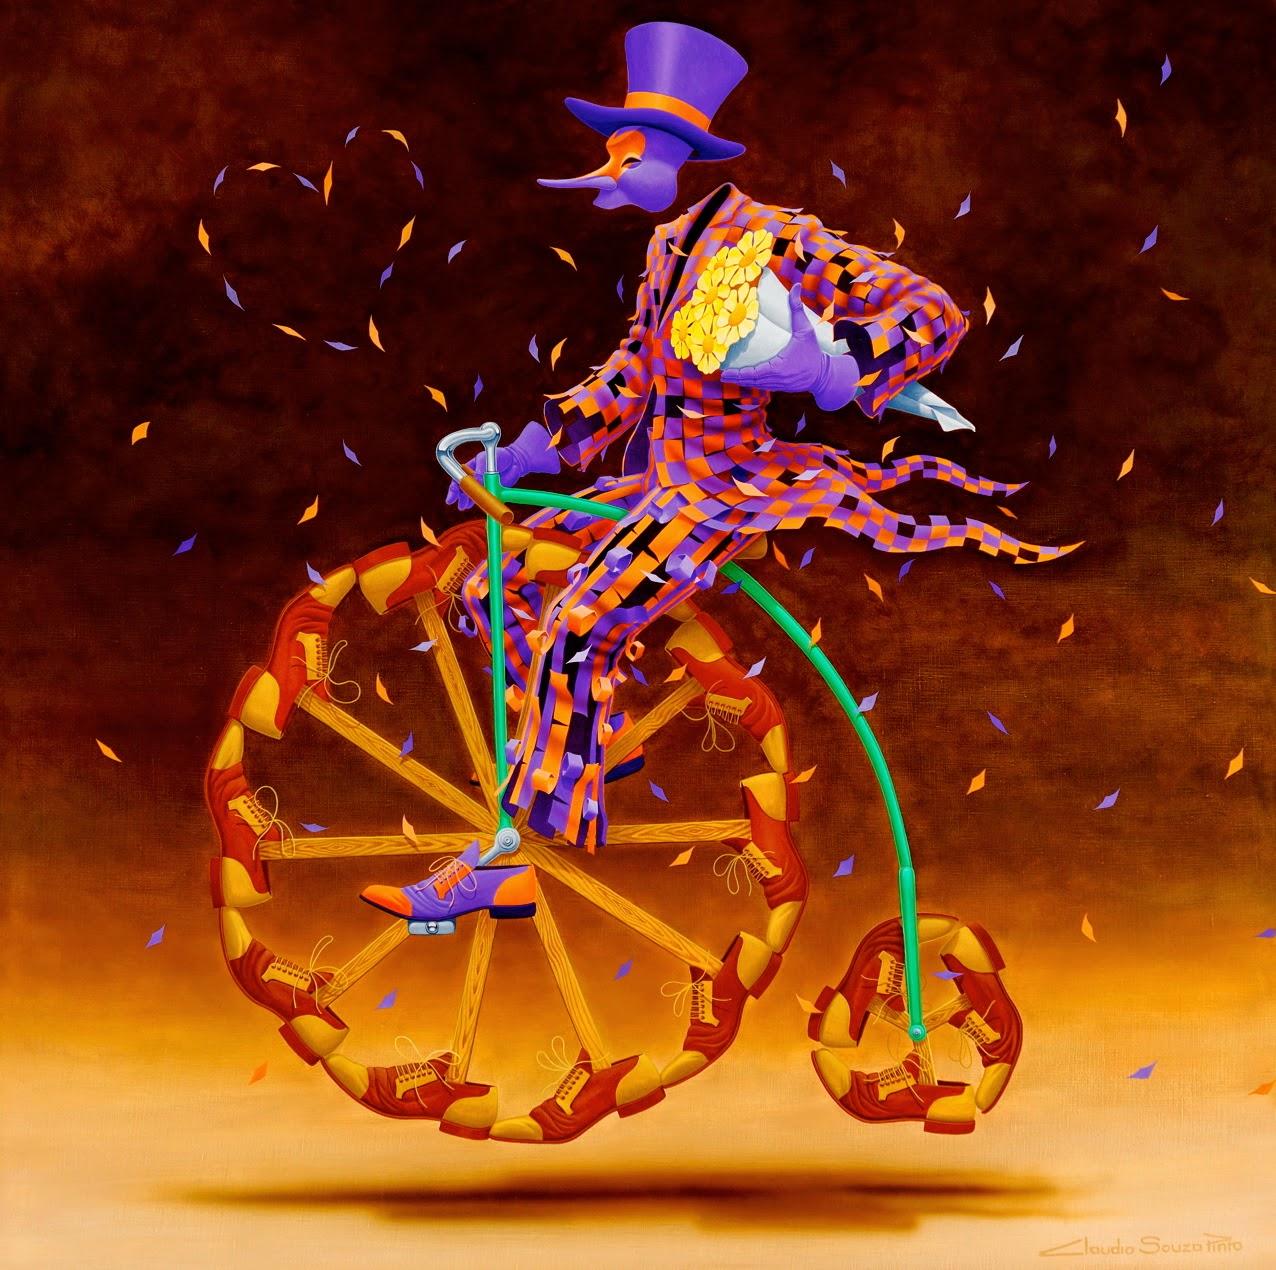 Flores - Claudio Souza Pinto e suas pinturas cheias de cor e criatividade